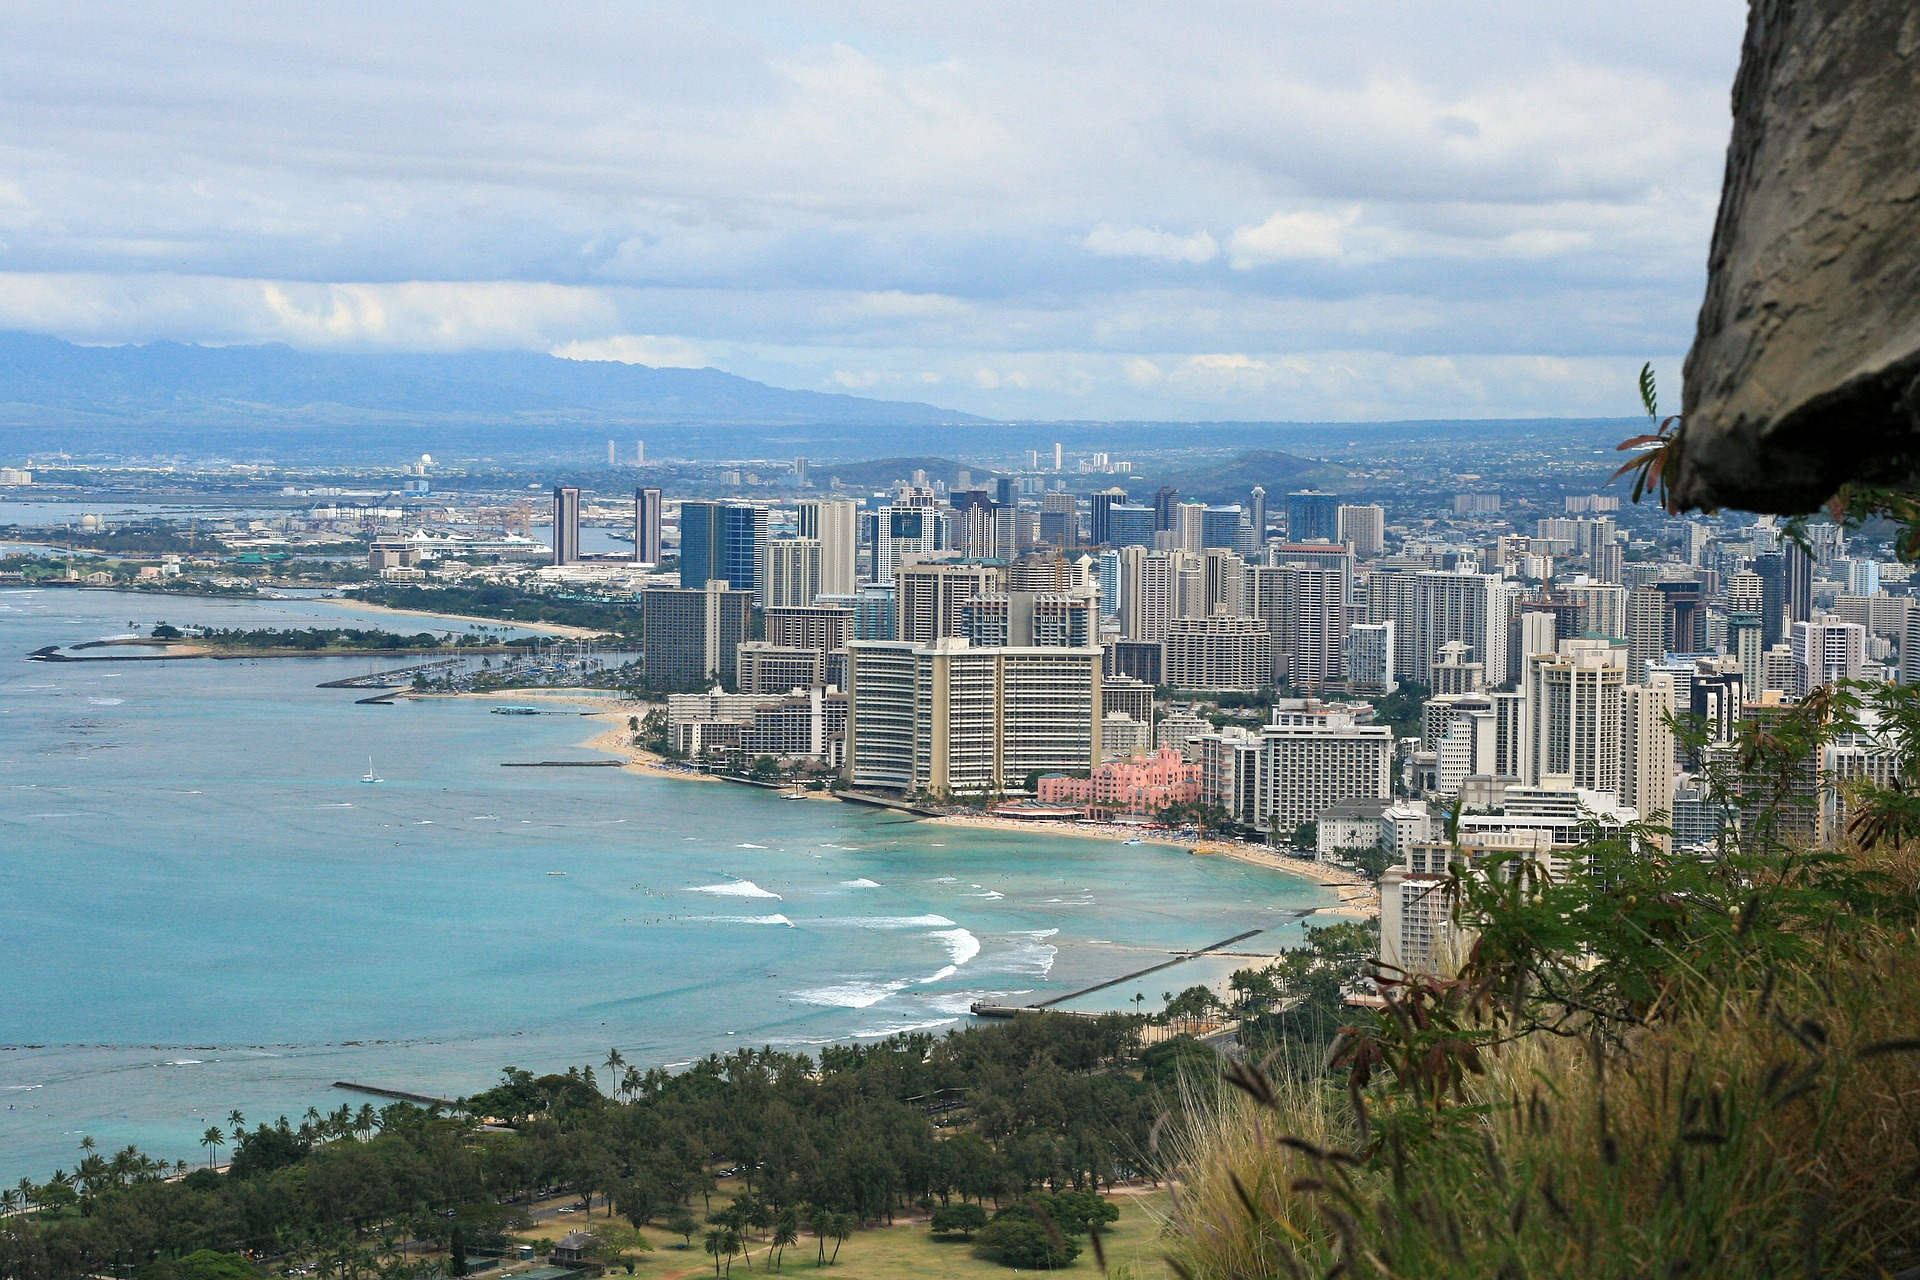 Waikiki Beach, Diamond Head, Honolulu, Hawaii, USA